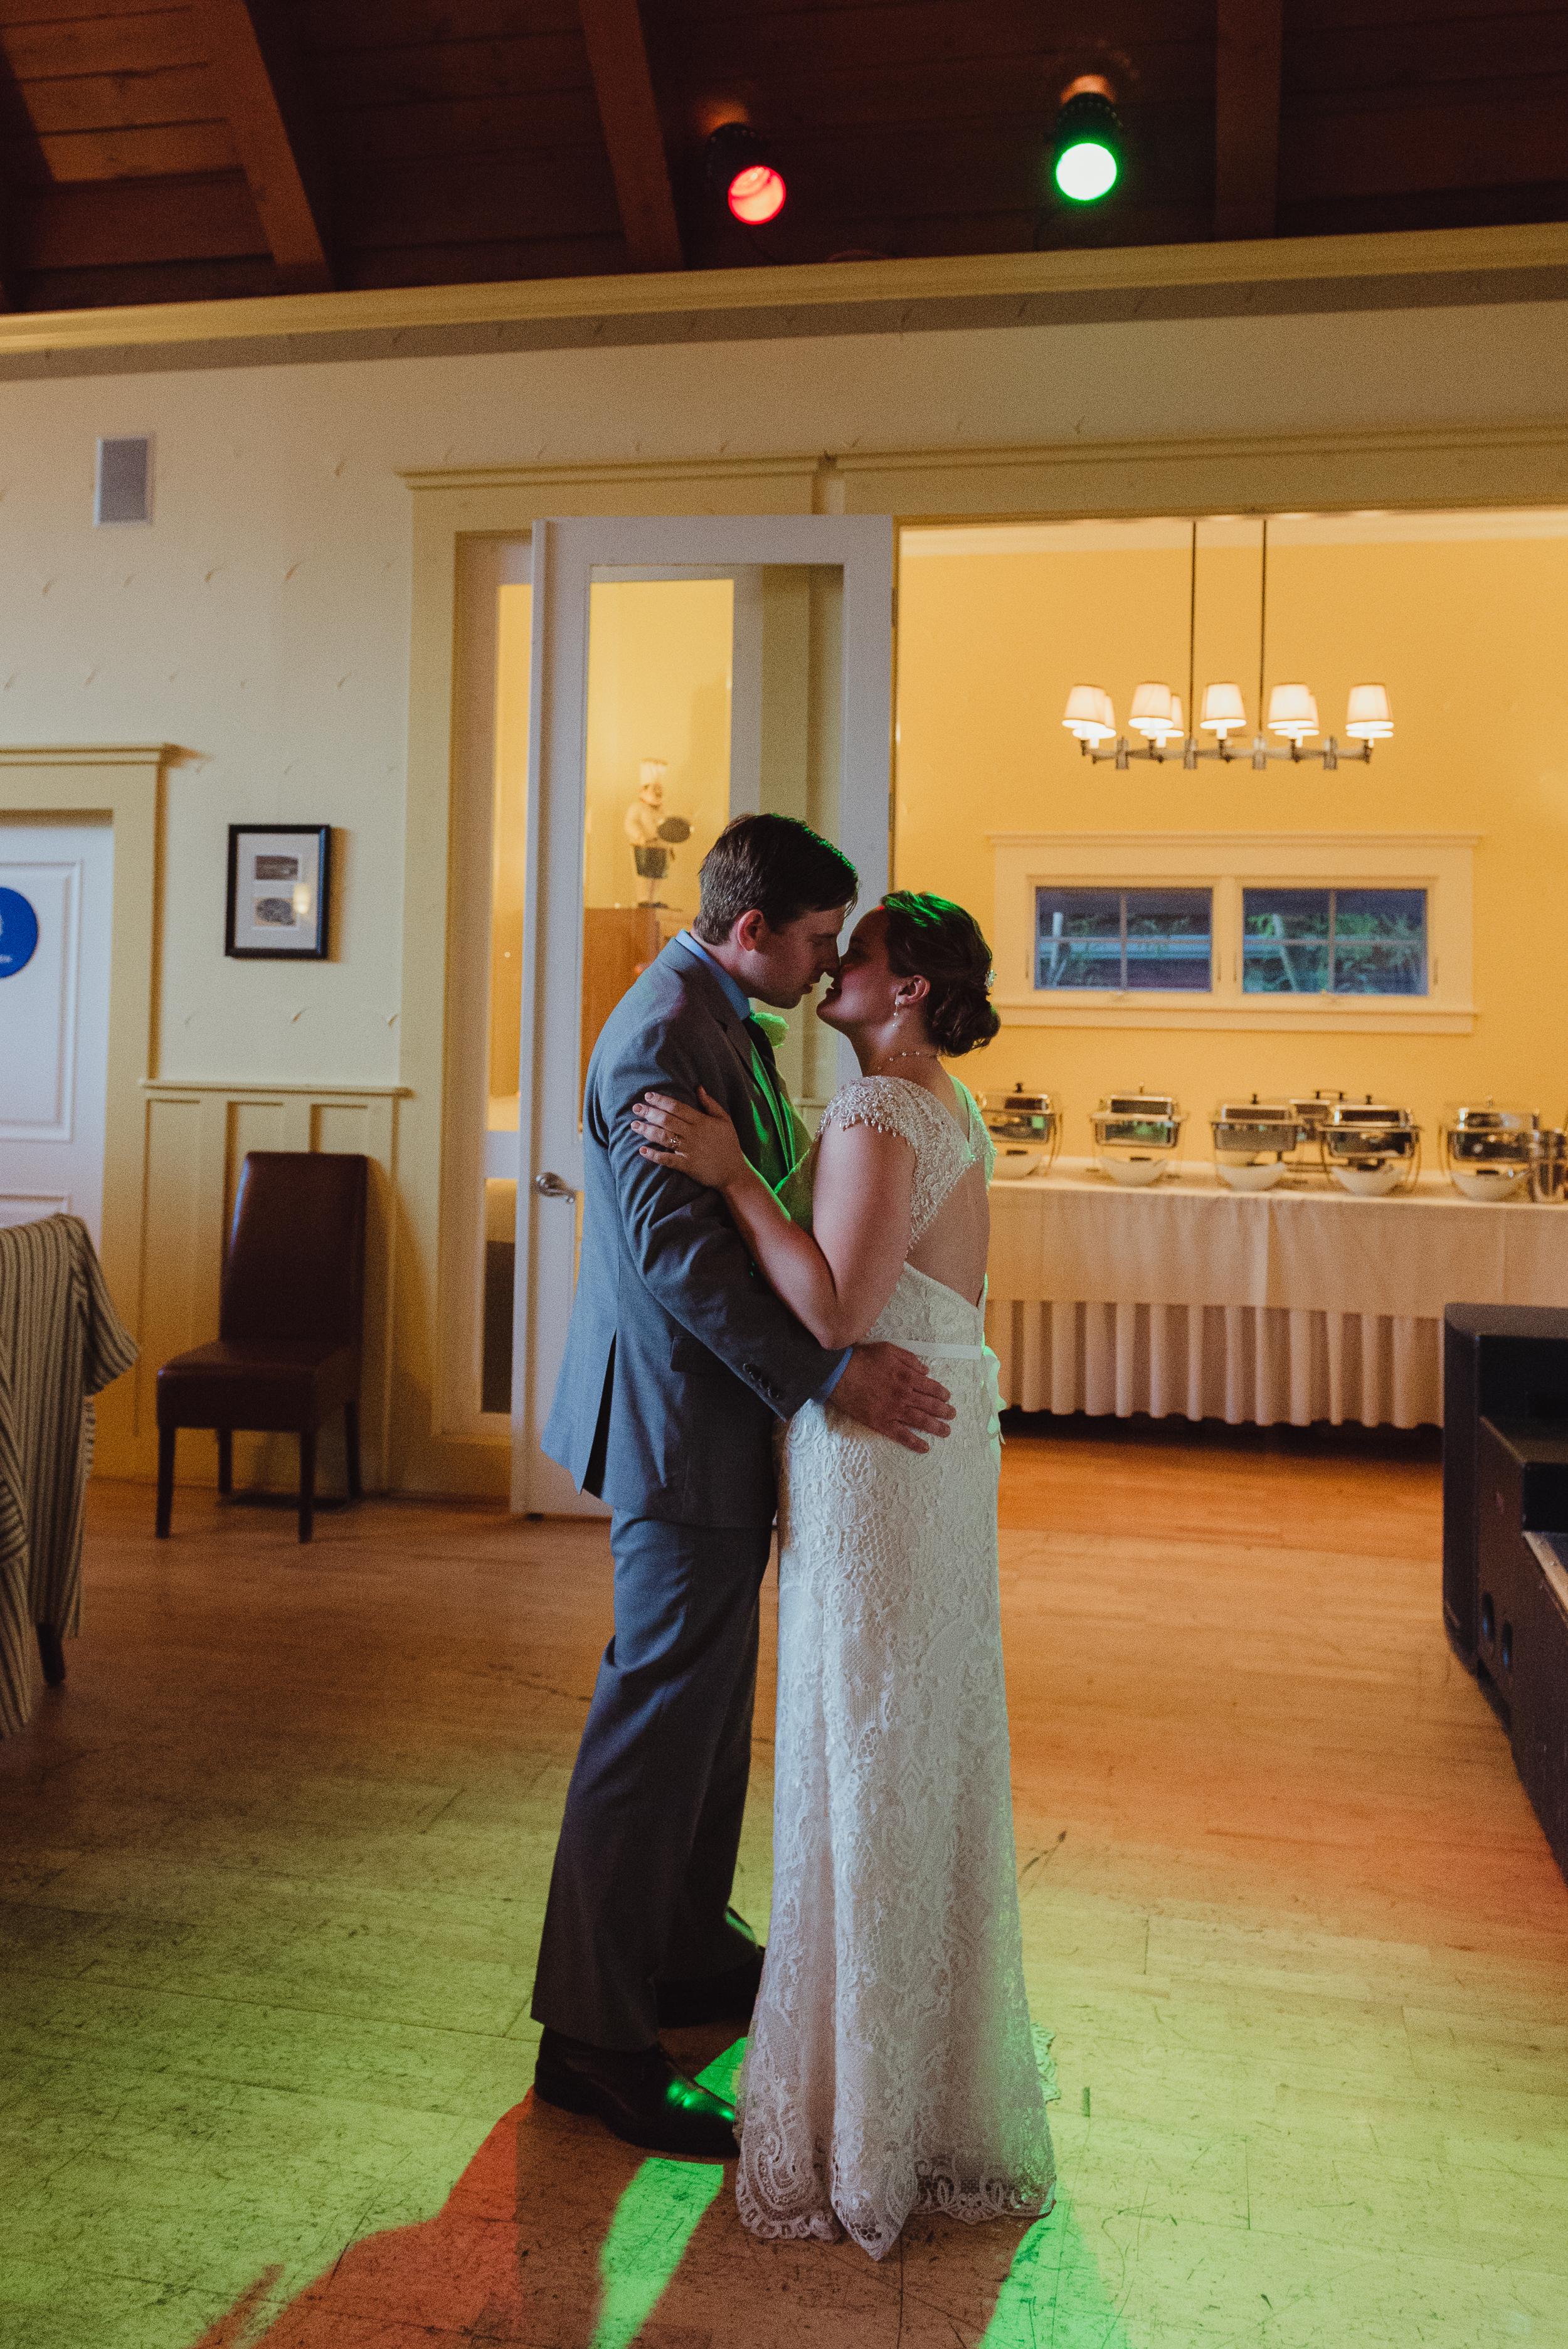 094-highland-dell-lodge-russian-river-wedding-vivianchen-598.jpg